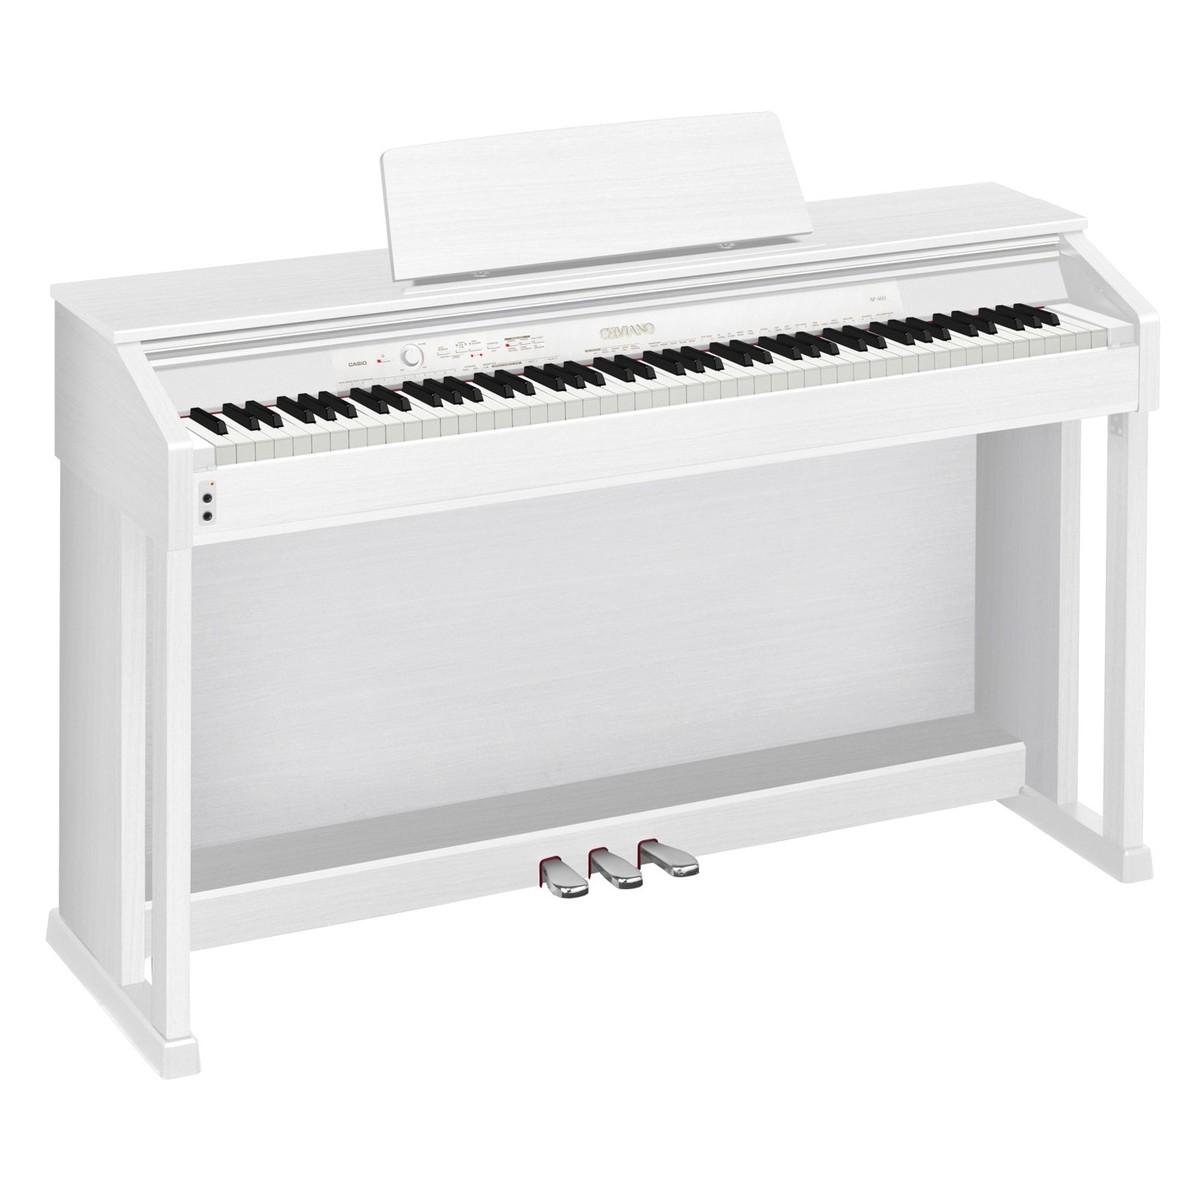 casio celviano ap 460 digital piano white at. Black Bedroom Furniture Sets. Home Design Ideas